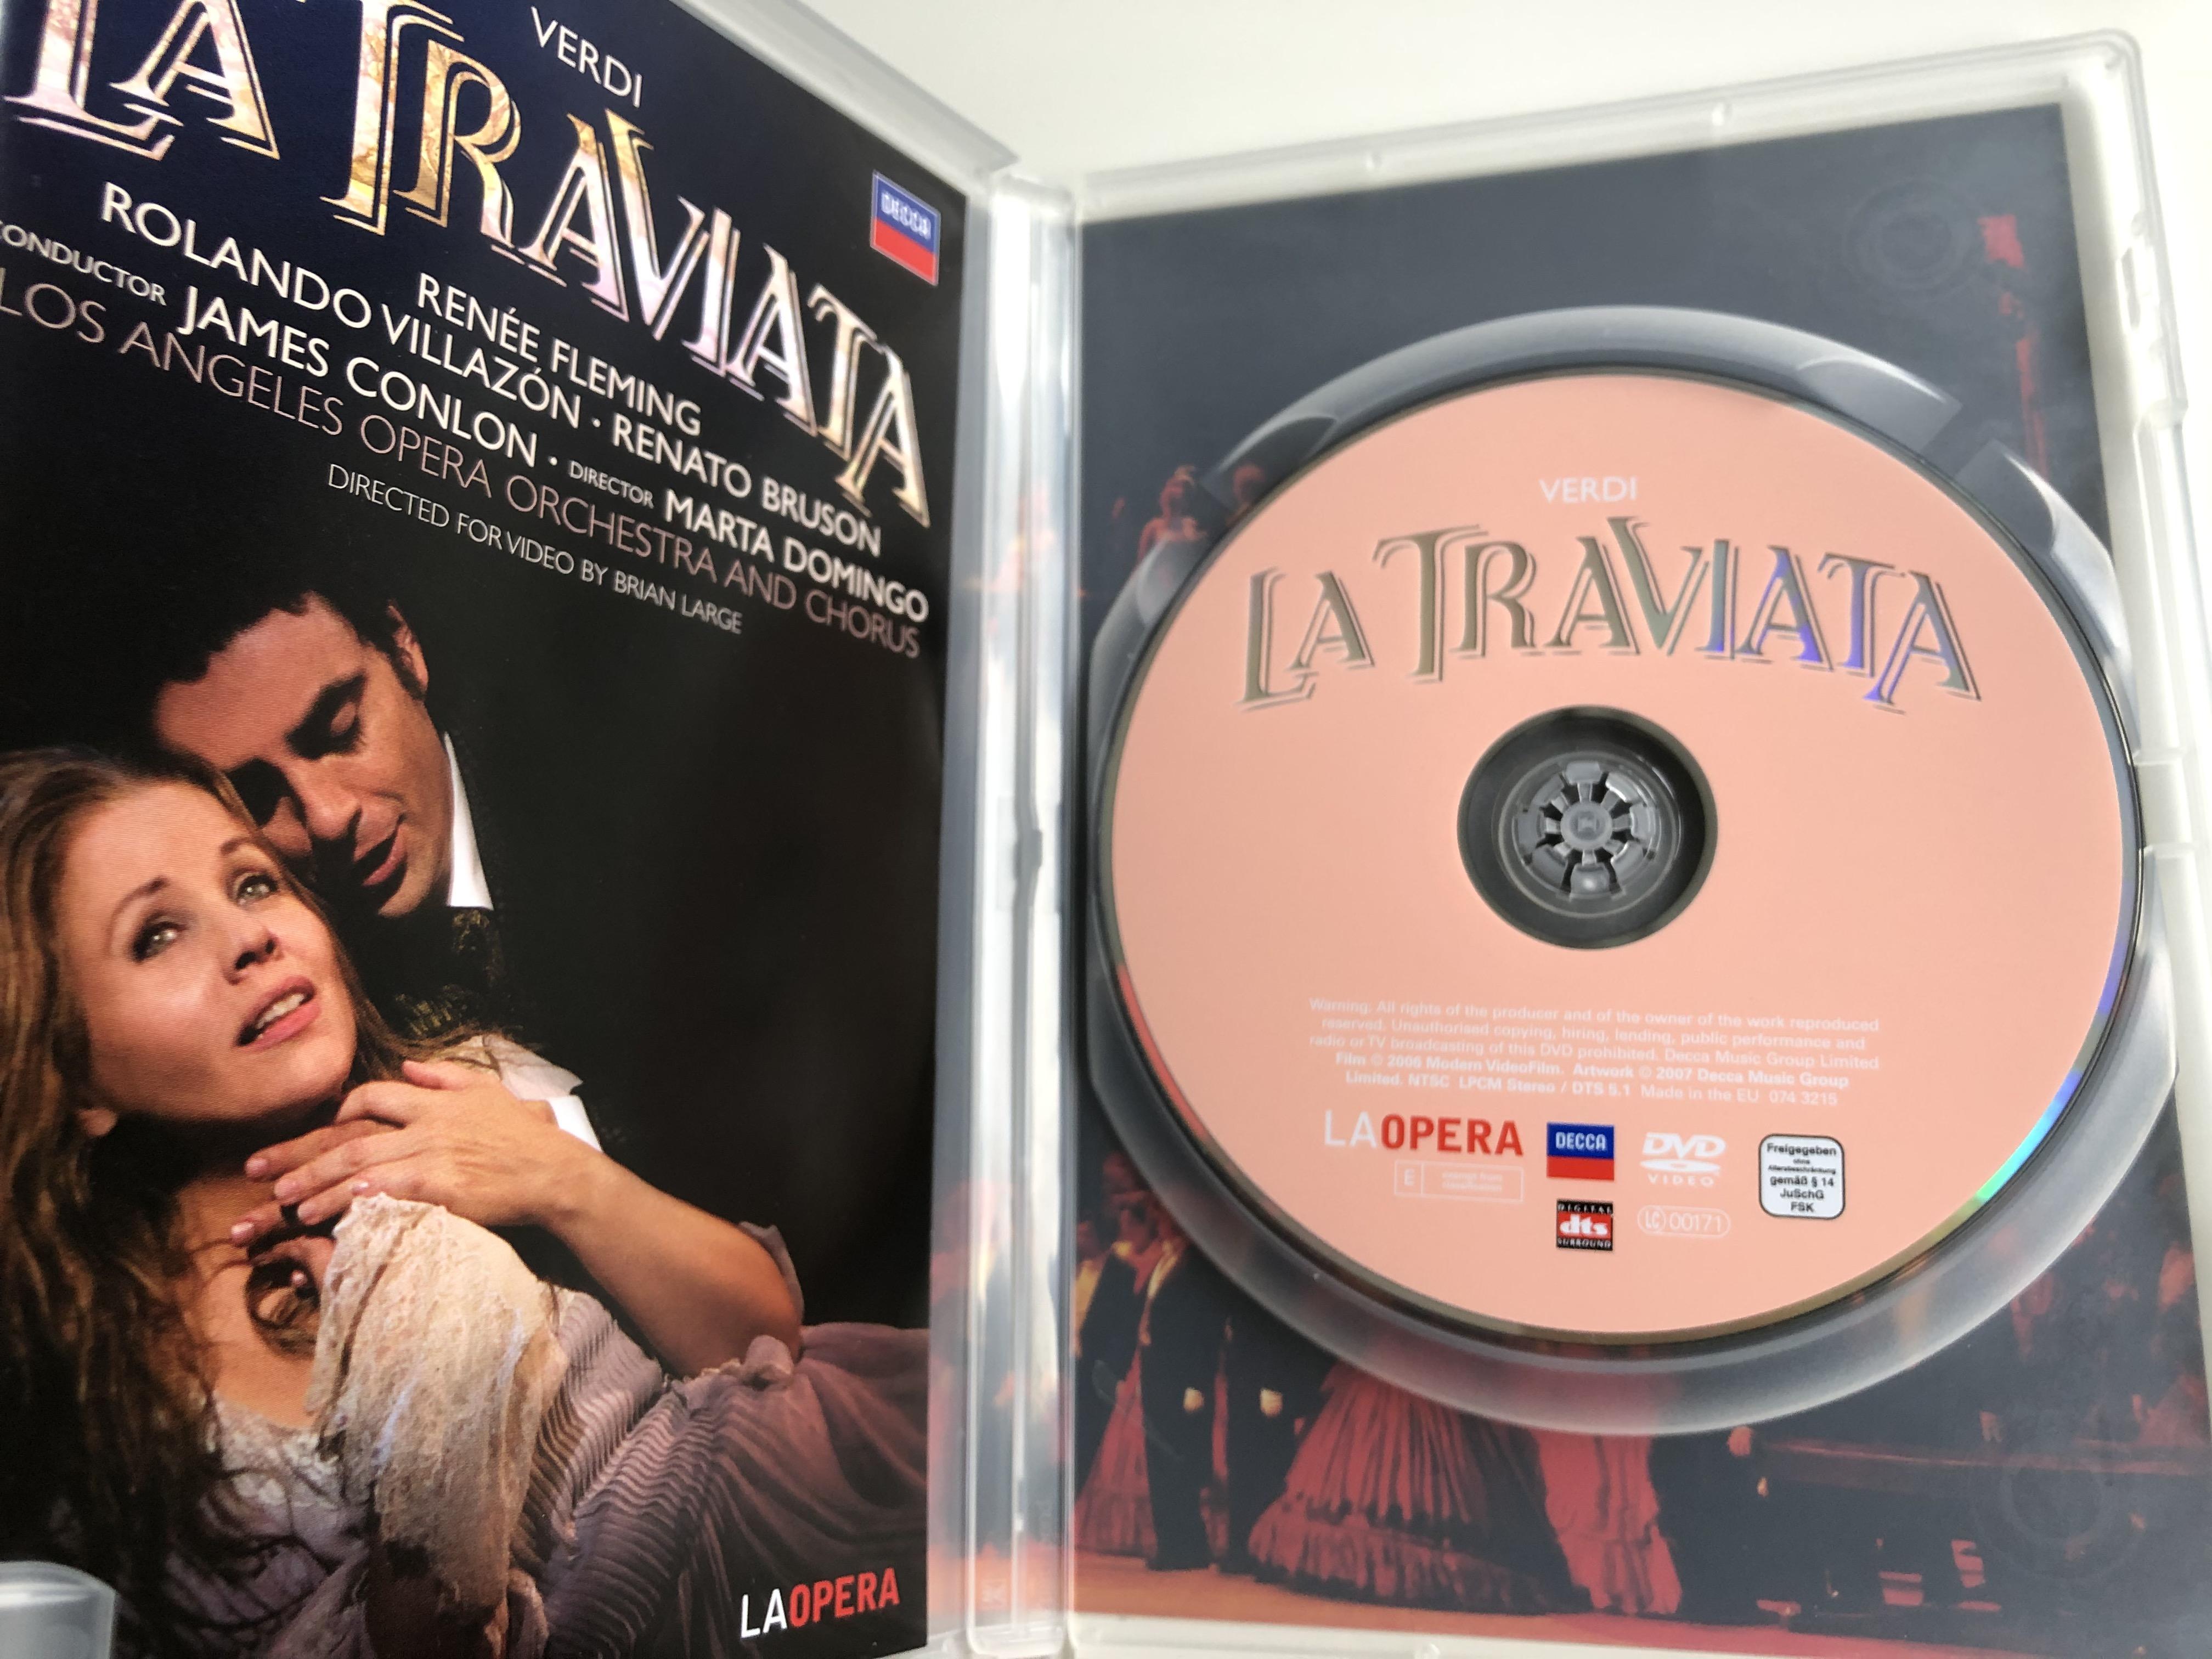 giuseppe-verdi-la-traviata-dvd-2006-directed-by-brian-large-pl-cido-domingo-2.jpg